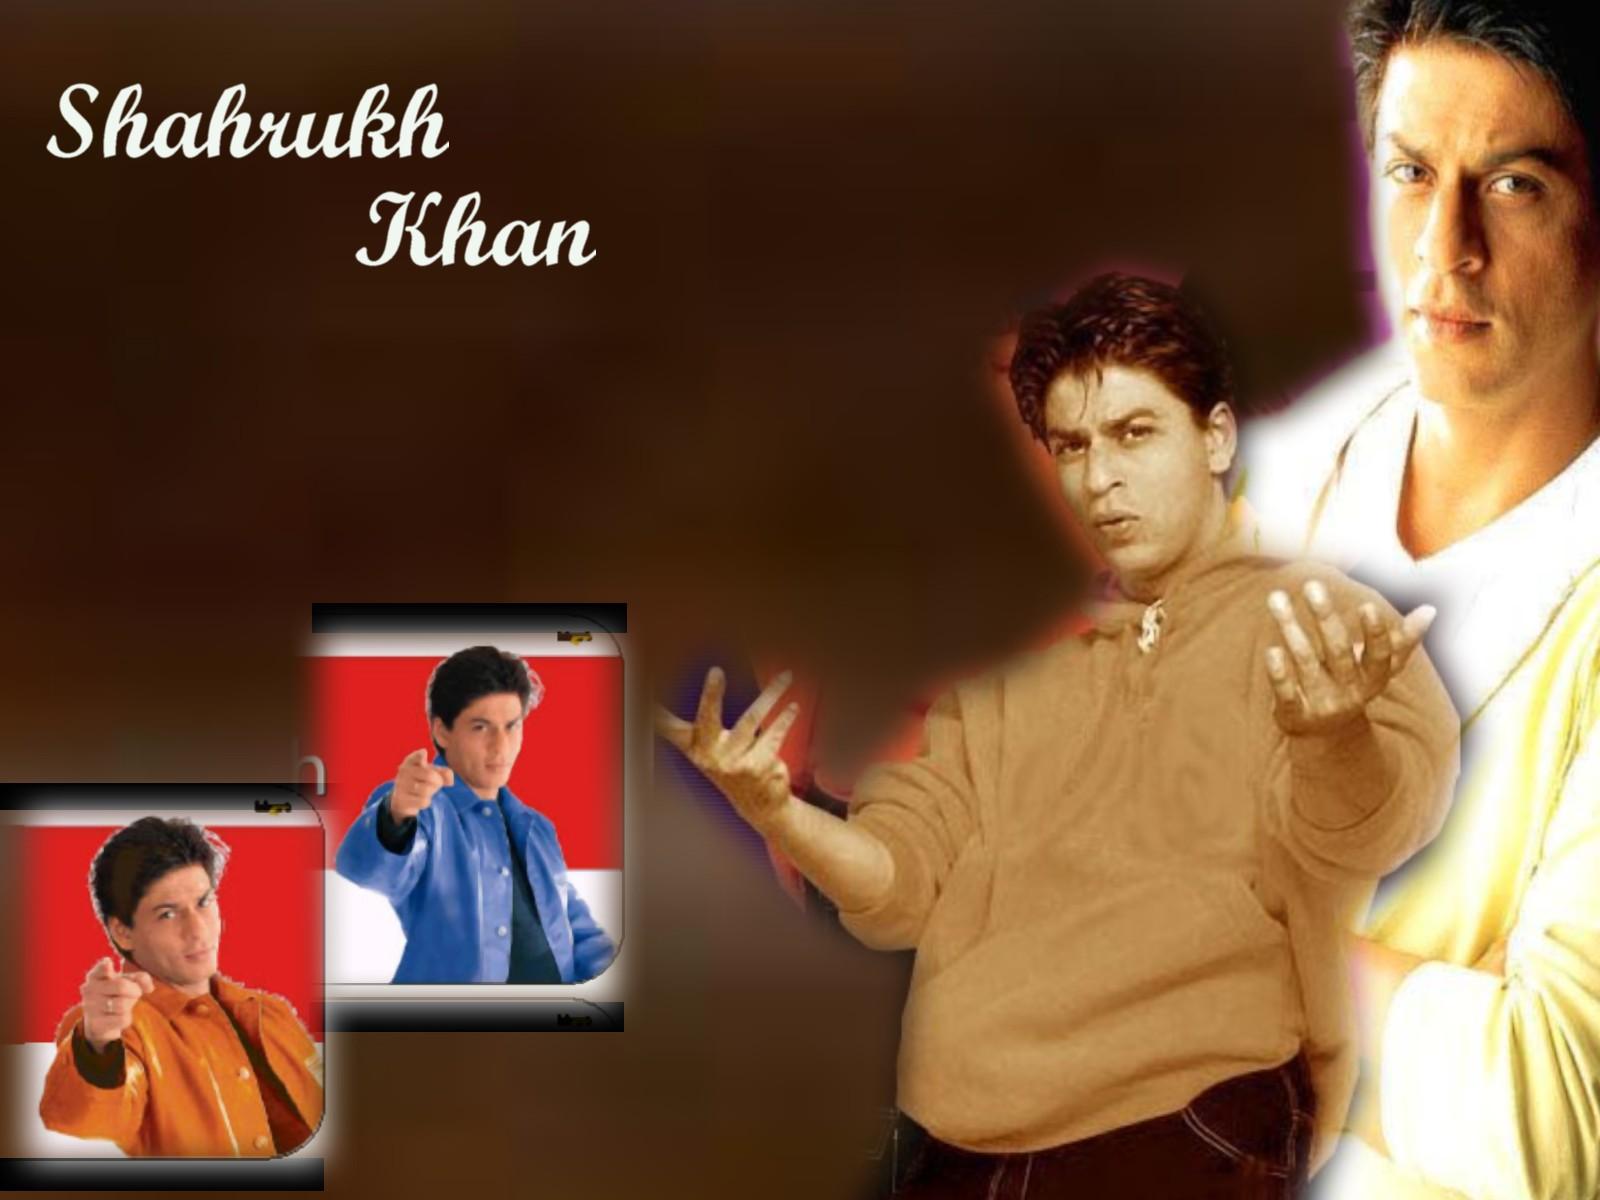 http://3.bp.blogspot.com/_zHx02JB4GE0/TRE2VESmXKI/AAAAAAAAAWA/udQFAgHCfSg/s1600/Shahrukh+Khan+Wallpaper+%252810%2529.jpg